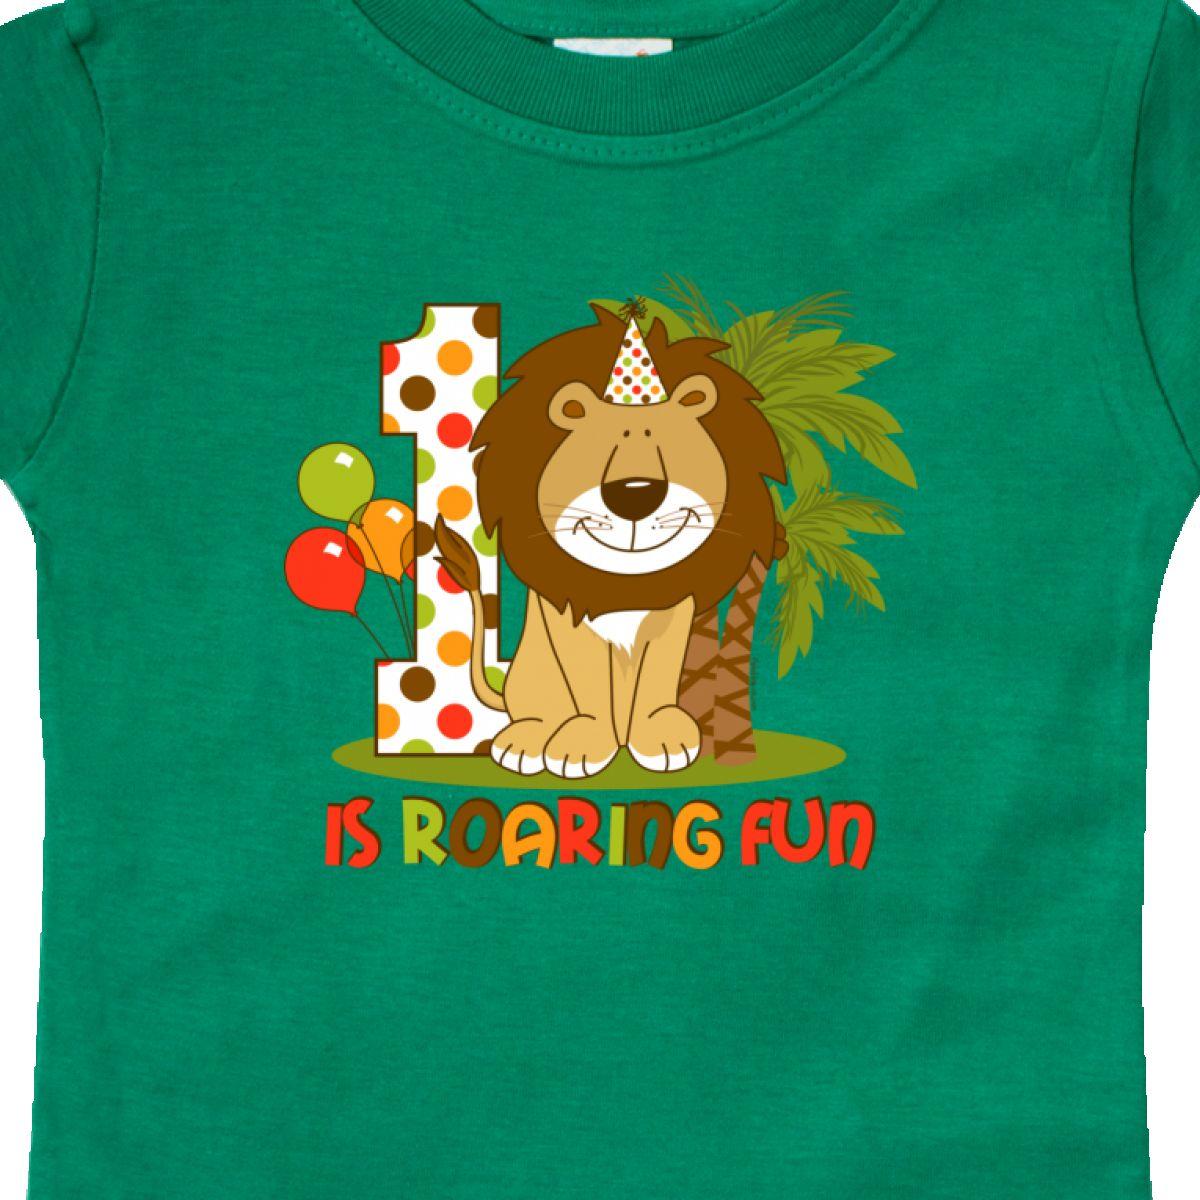 Inktastic-Cute-Lion-1st-Birthday-Baby-T-Shirt-Roaring-Fun-Pinkinkartkids-First thumbnail 8